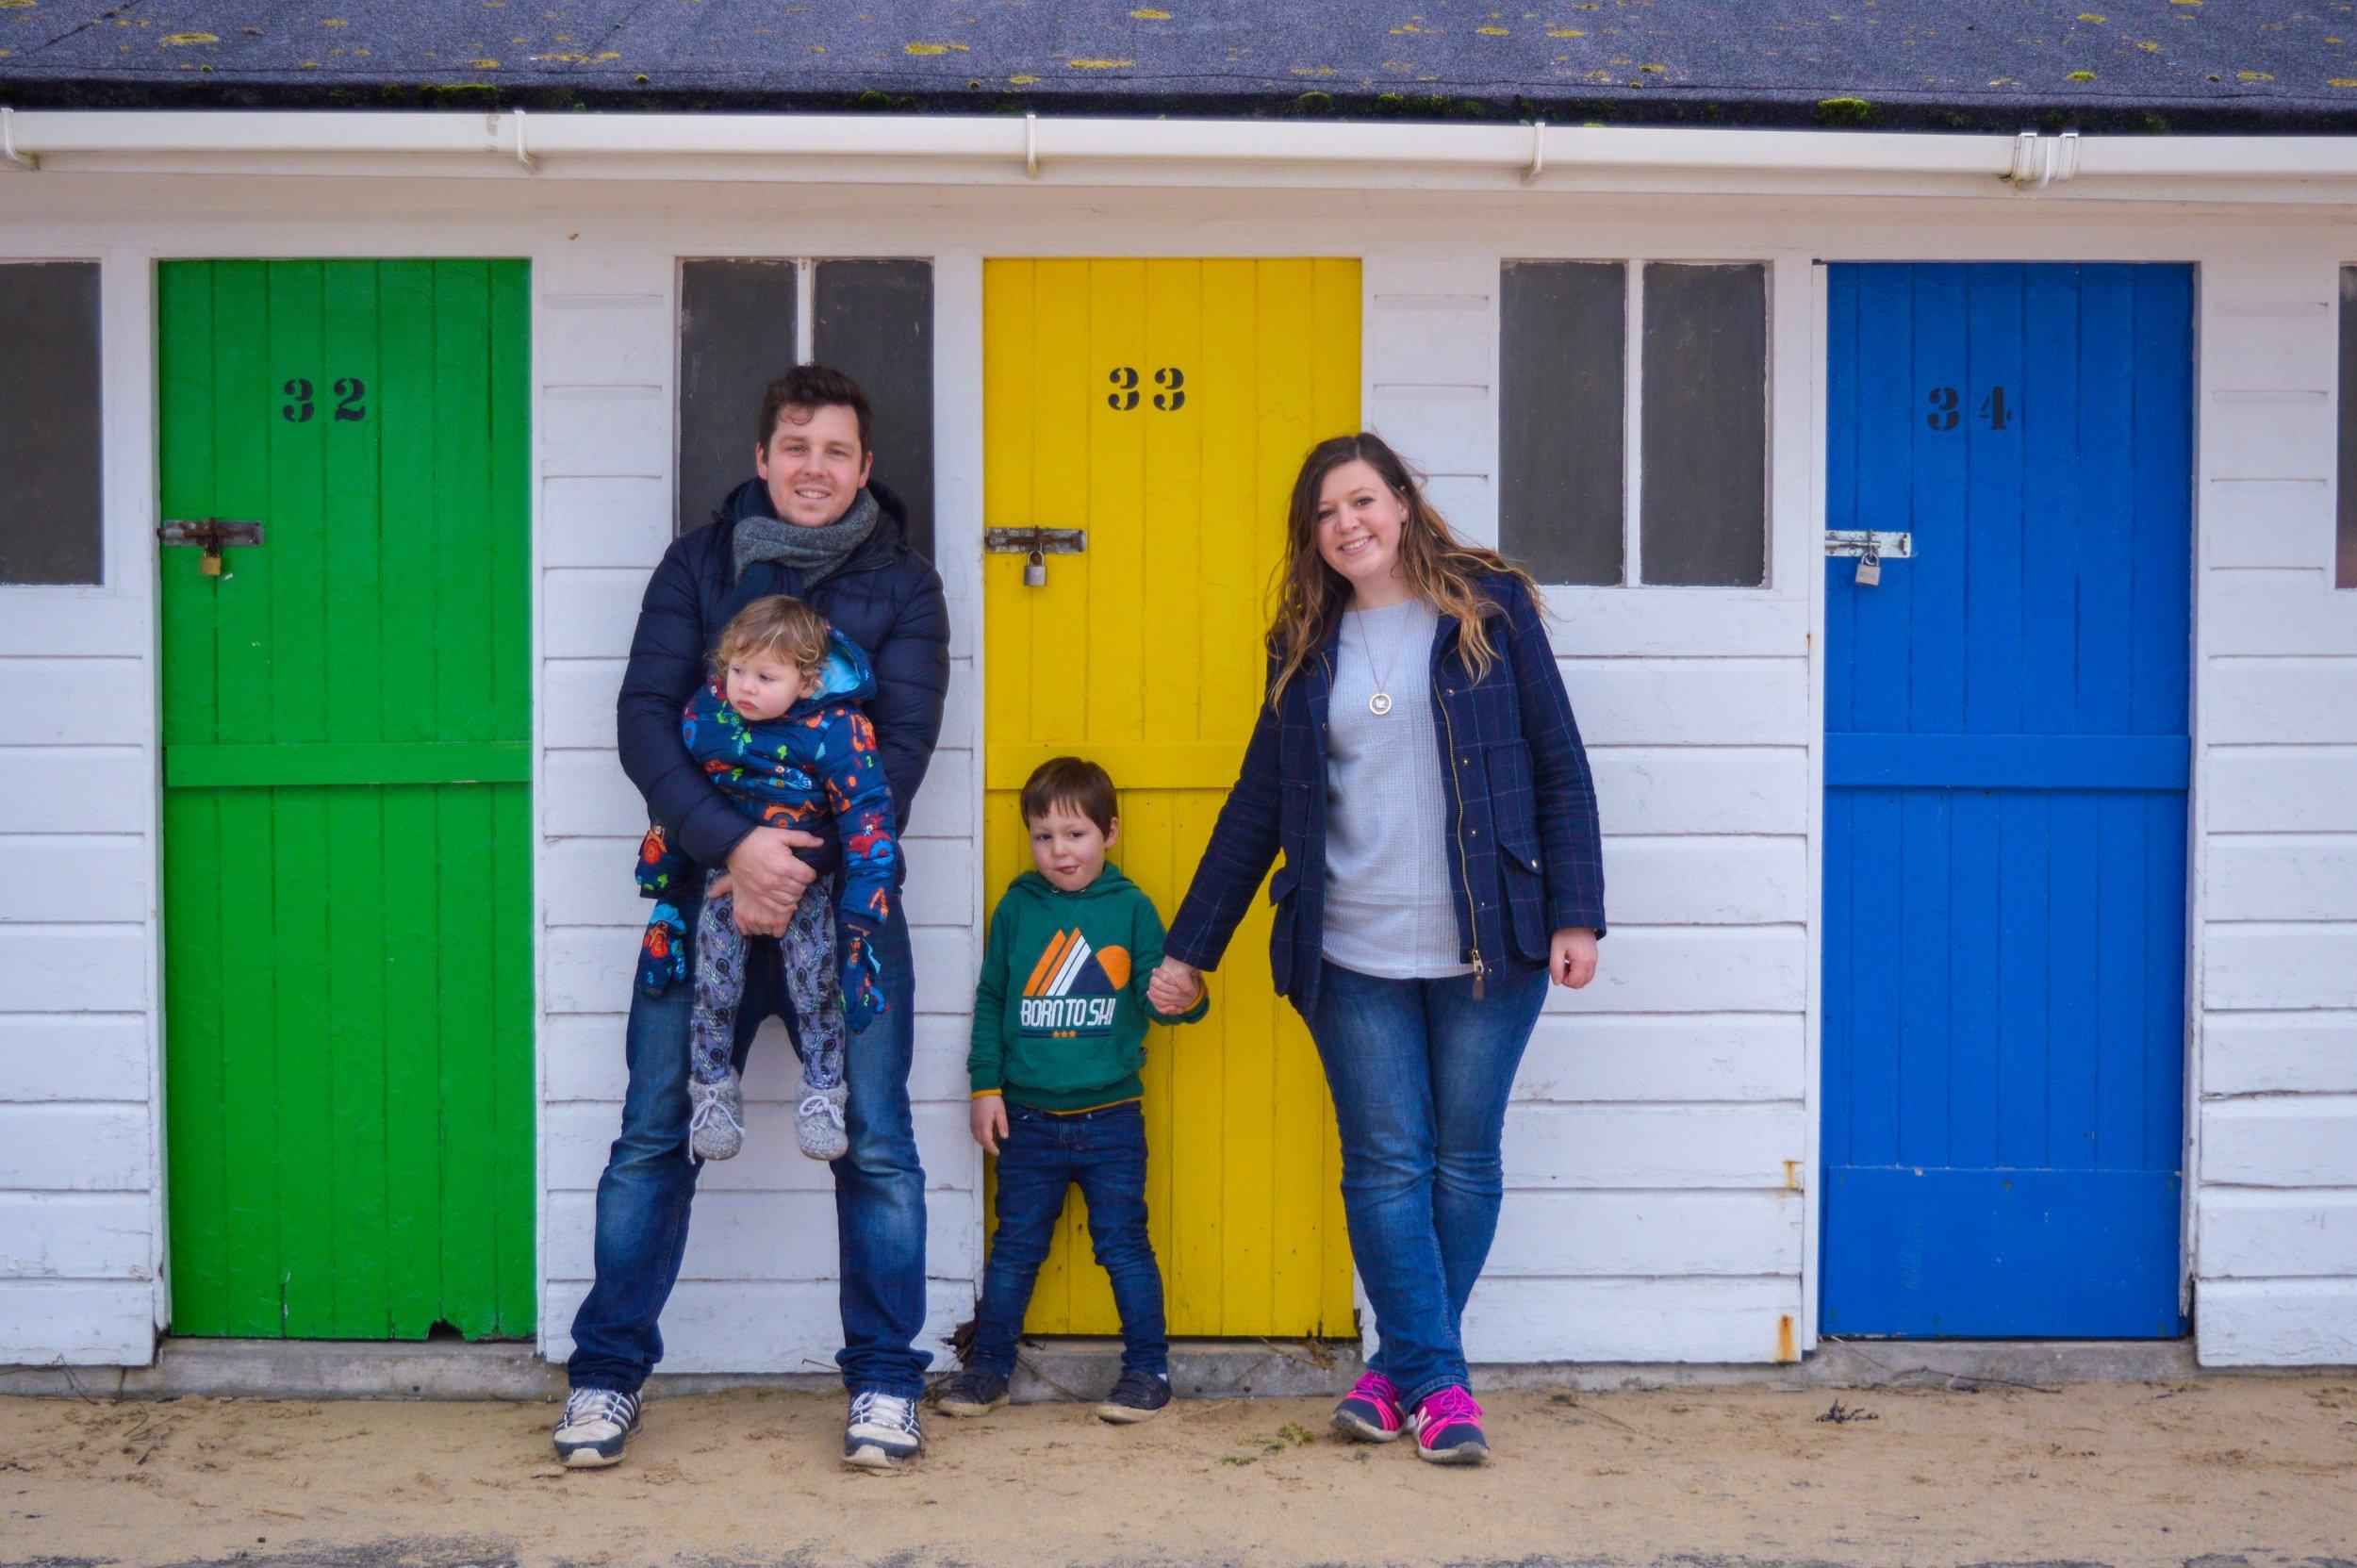 A rare family photo taken at Porthminster Beach